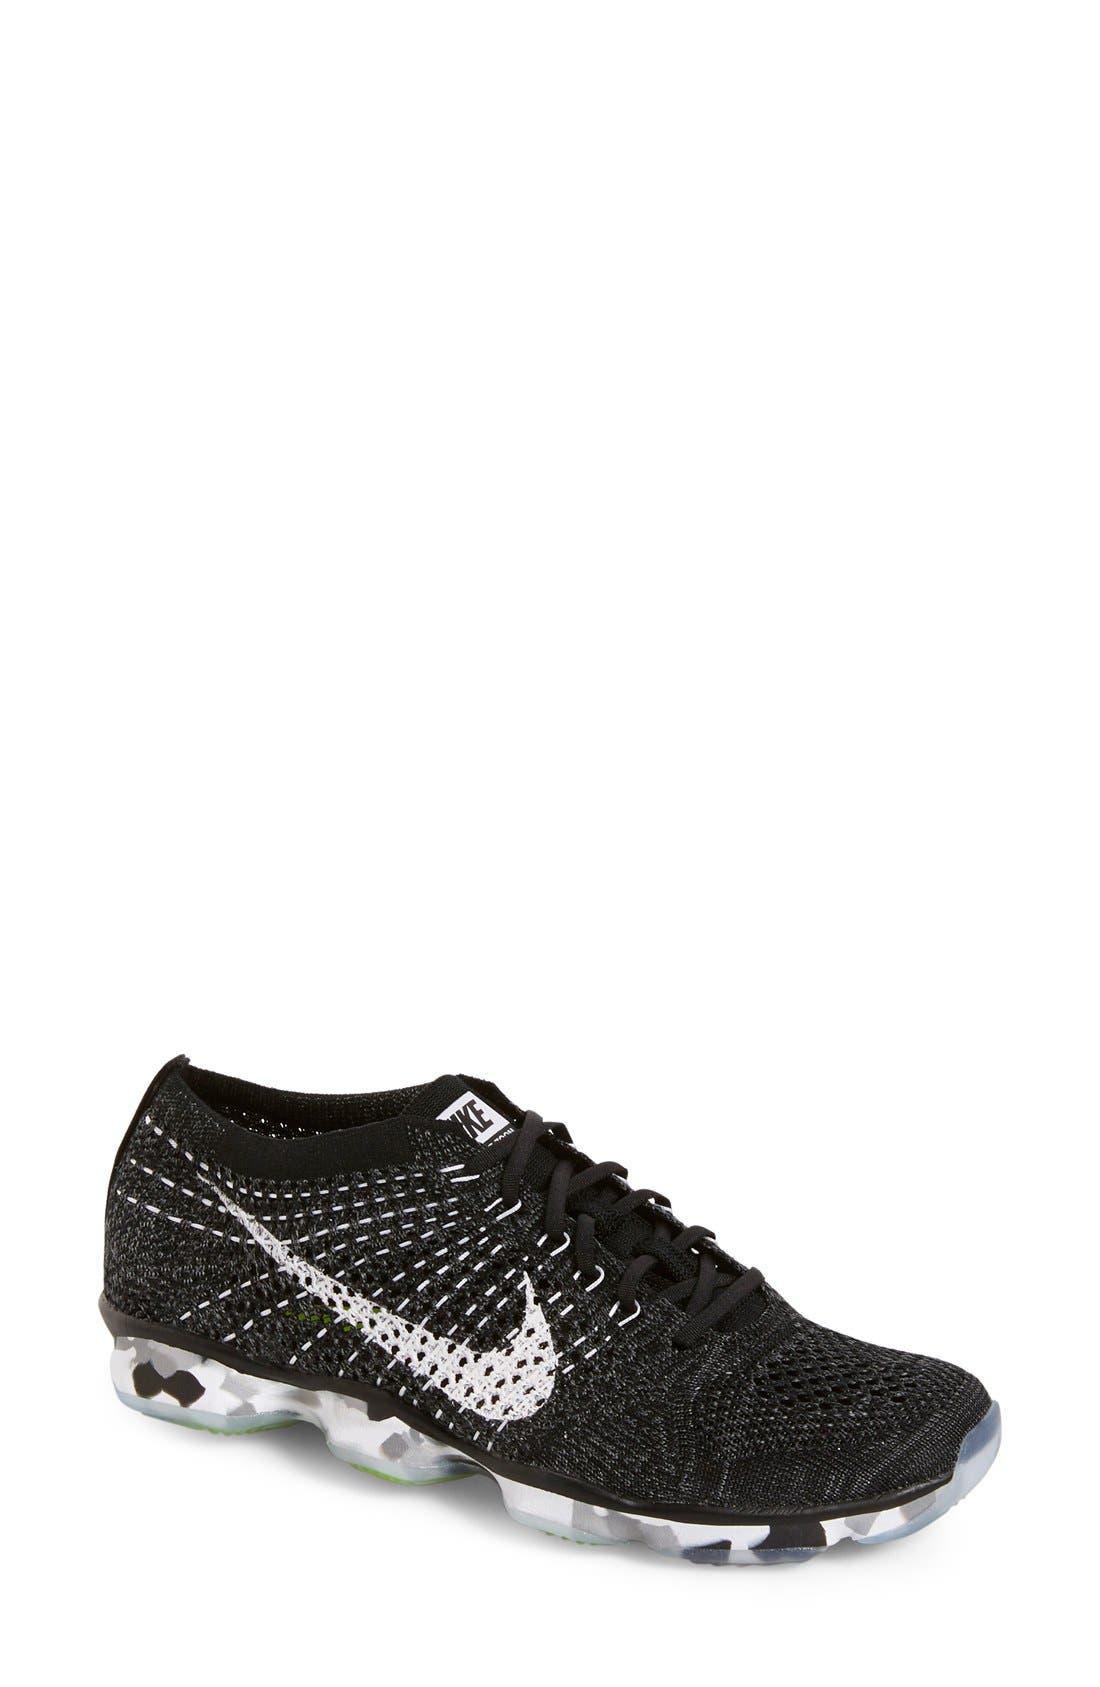 Alternate Image 1 Selected - Nike 'Flyknit Zoom' Agility Training Shoe (Women)